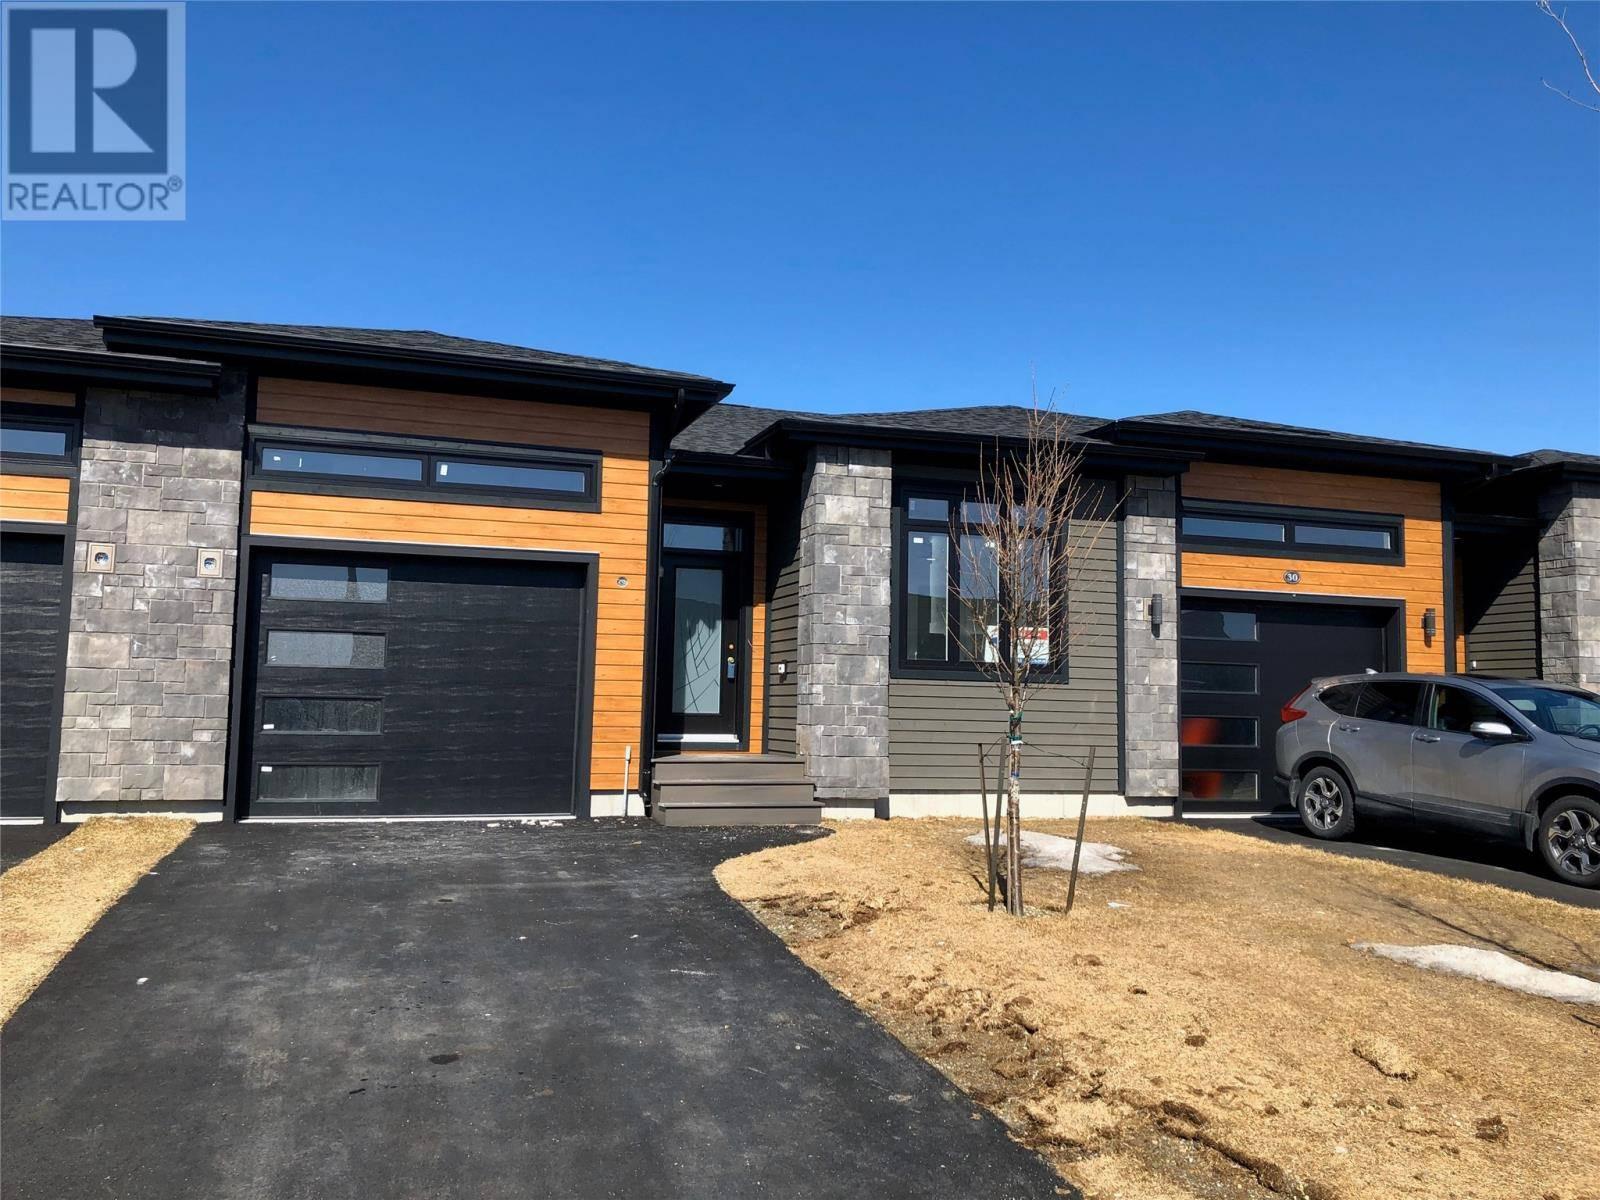 House for sale at 37 Clifden Woods Pl St. John's Newfoundland - MLS: 1209233